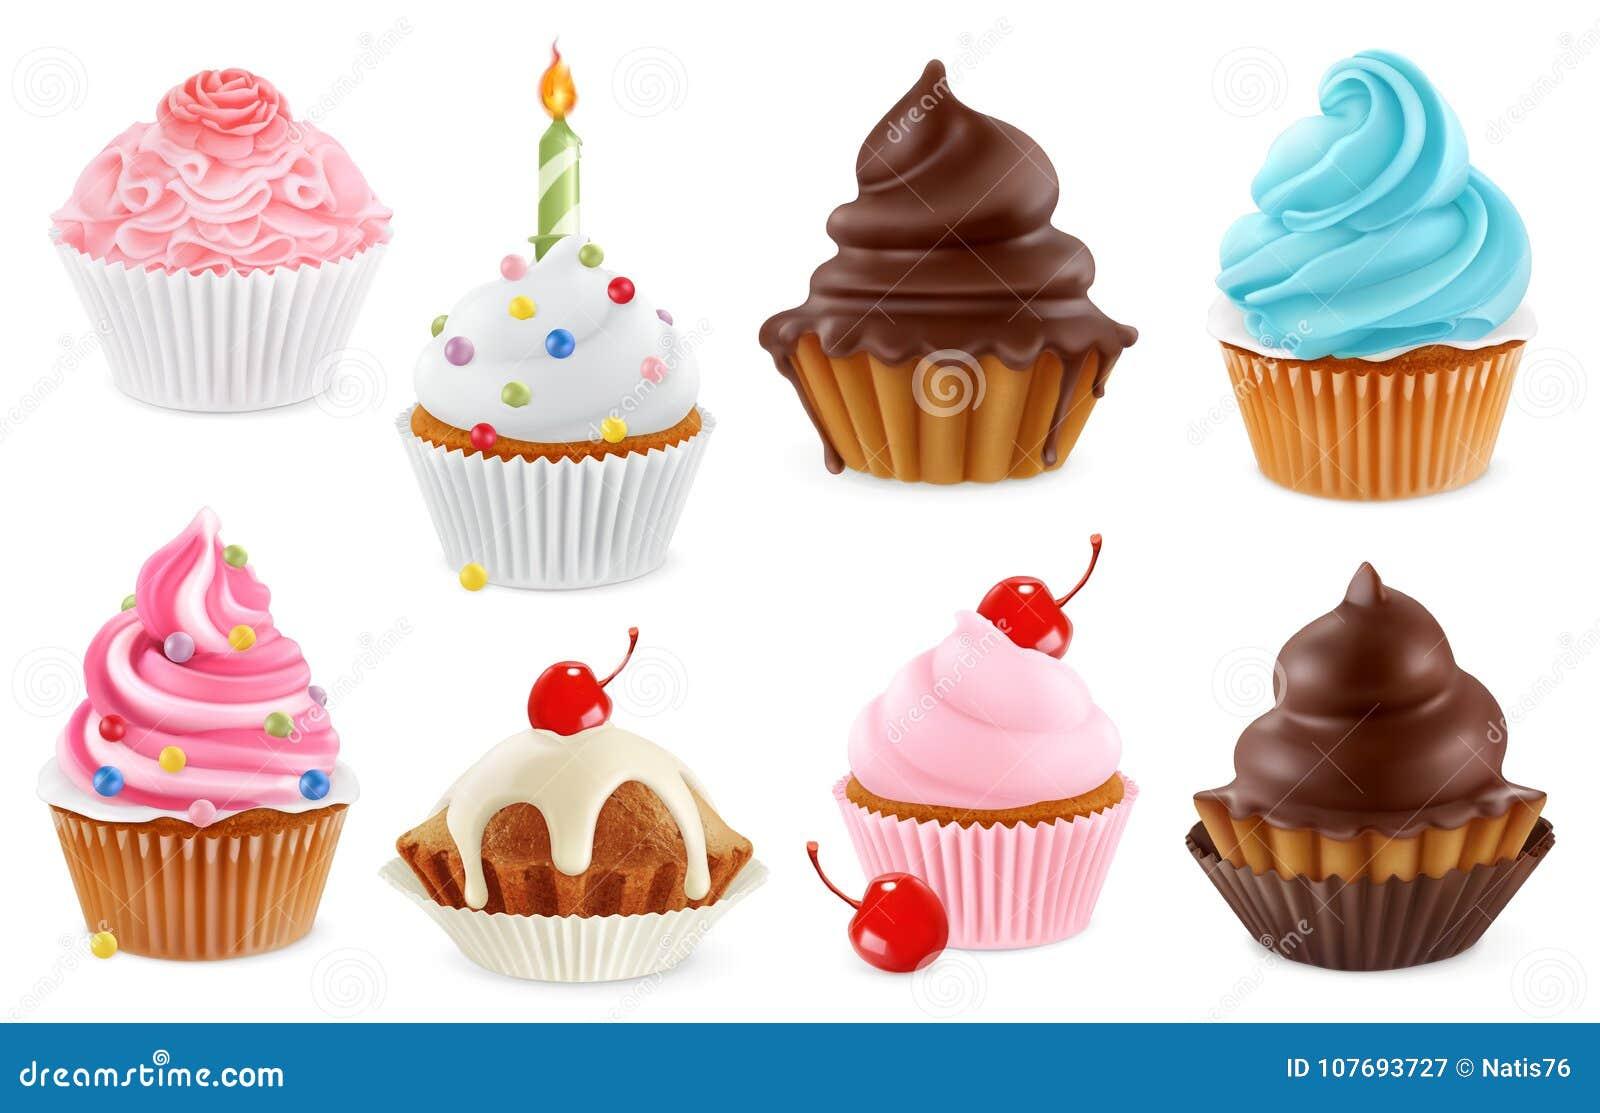 Kleiner Kuchen, feenhafter Kuchen Ikonensatz des Vektors 3d